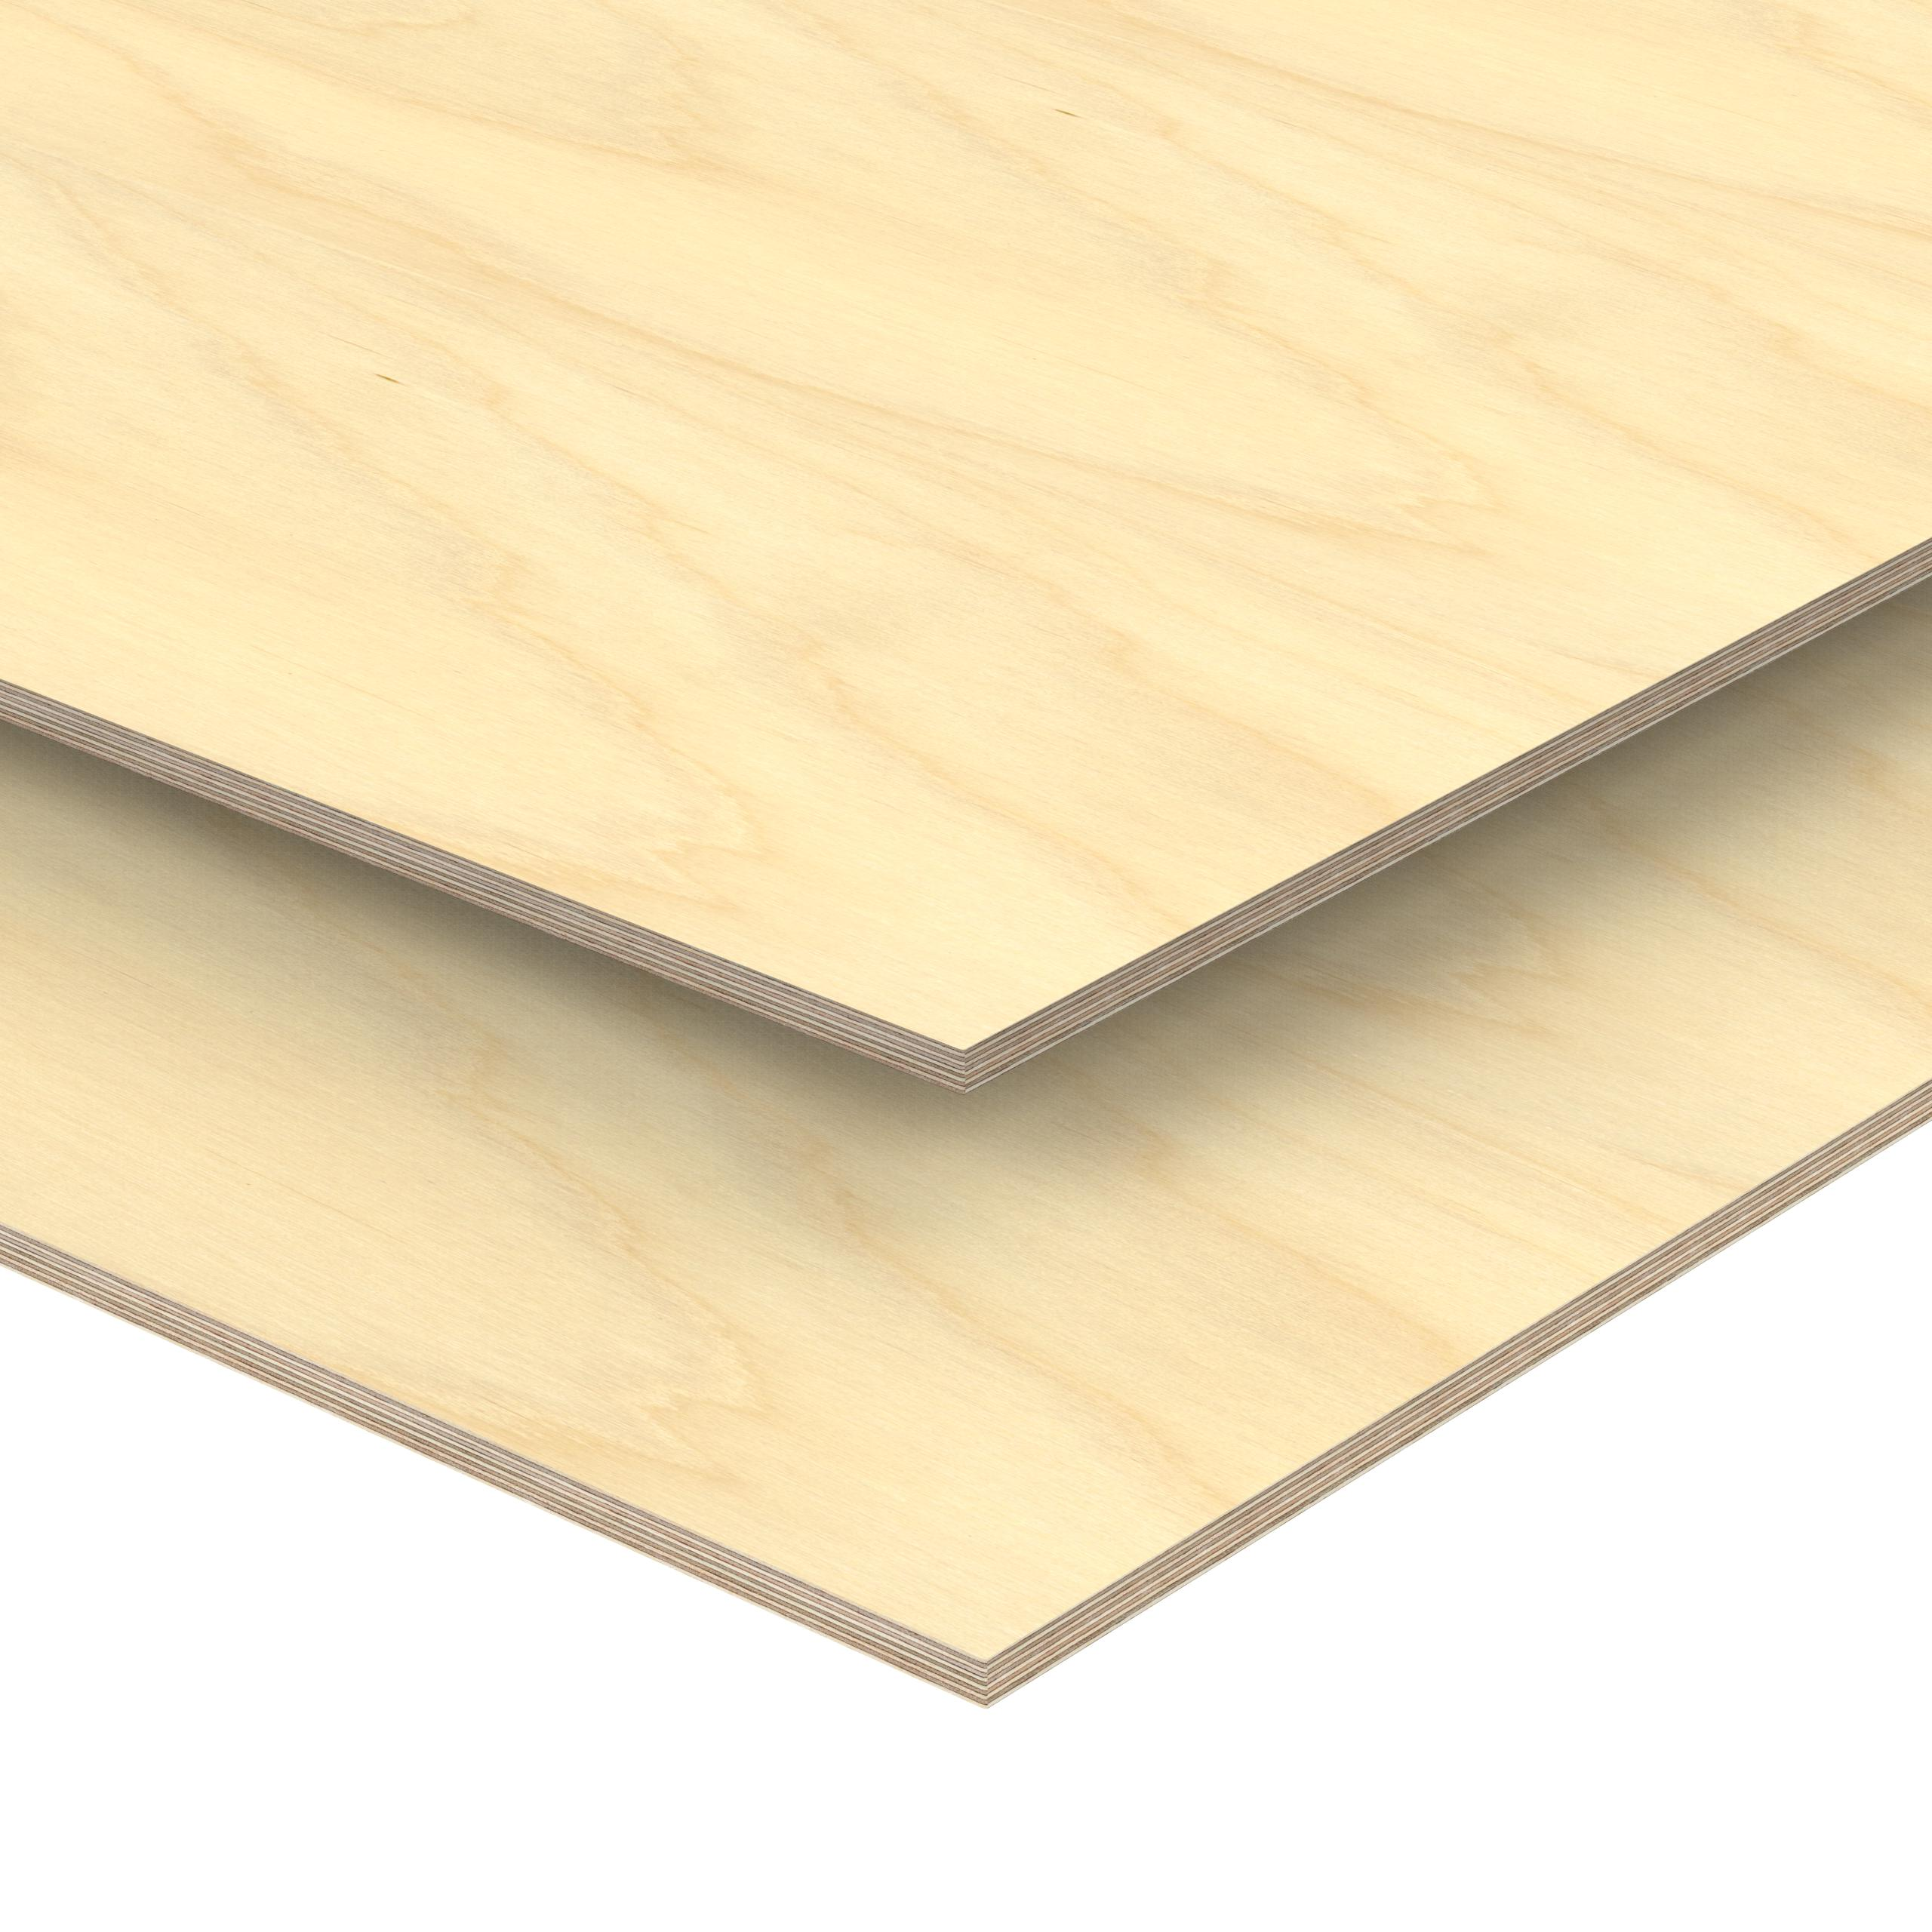 80x150 cm 30mm Multiplex Zuschnitt L/änge bis 200cm Multiplexplatten Zuschnitte Auswahl